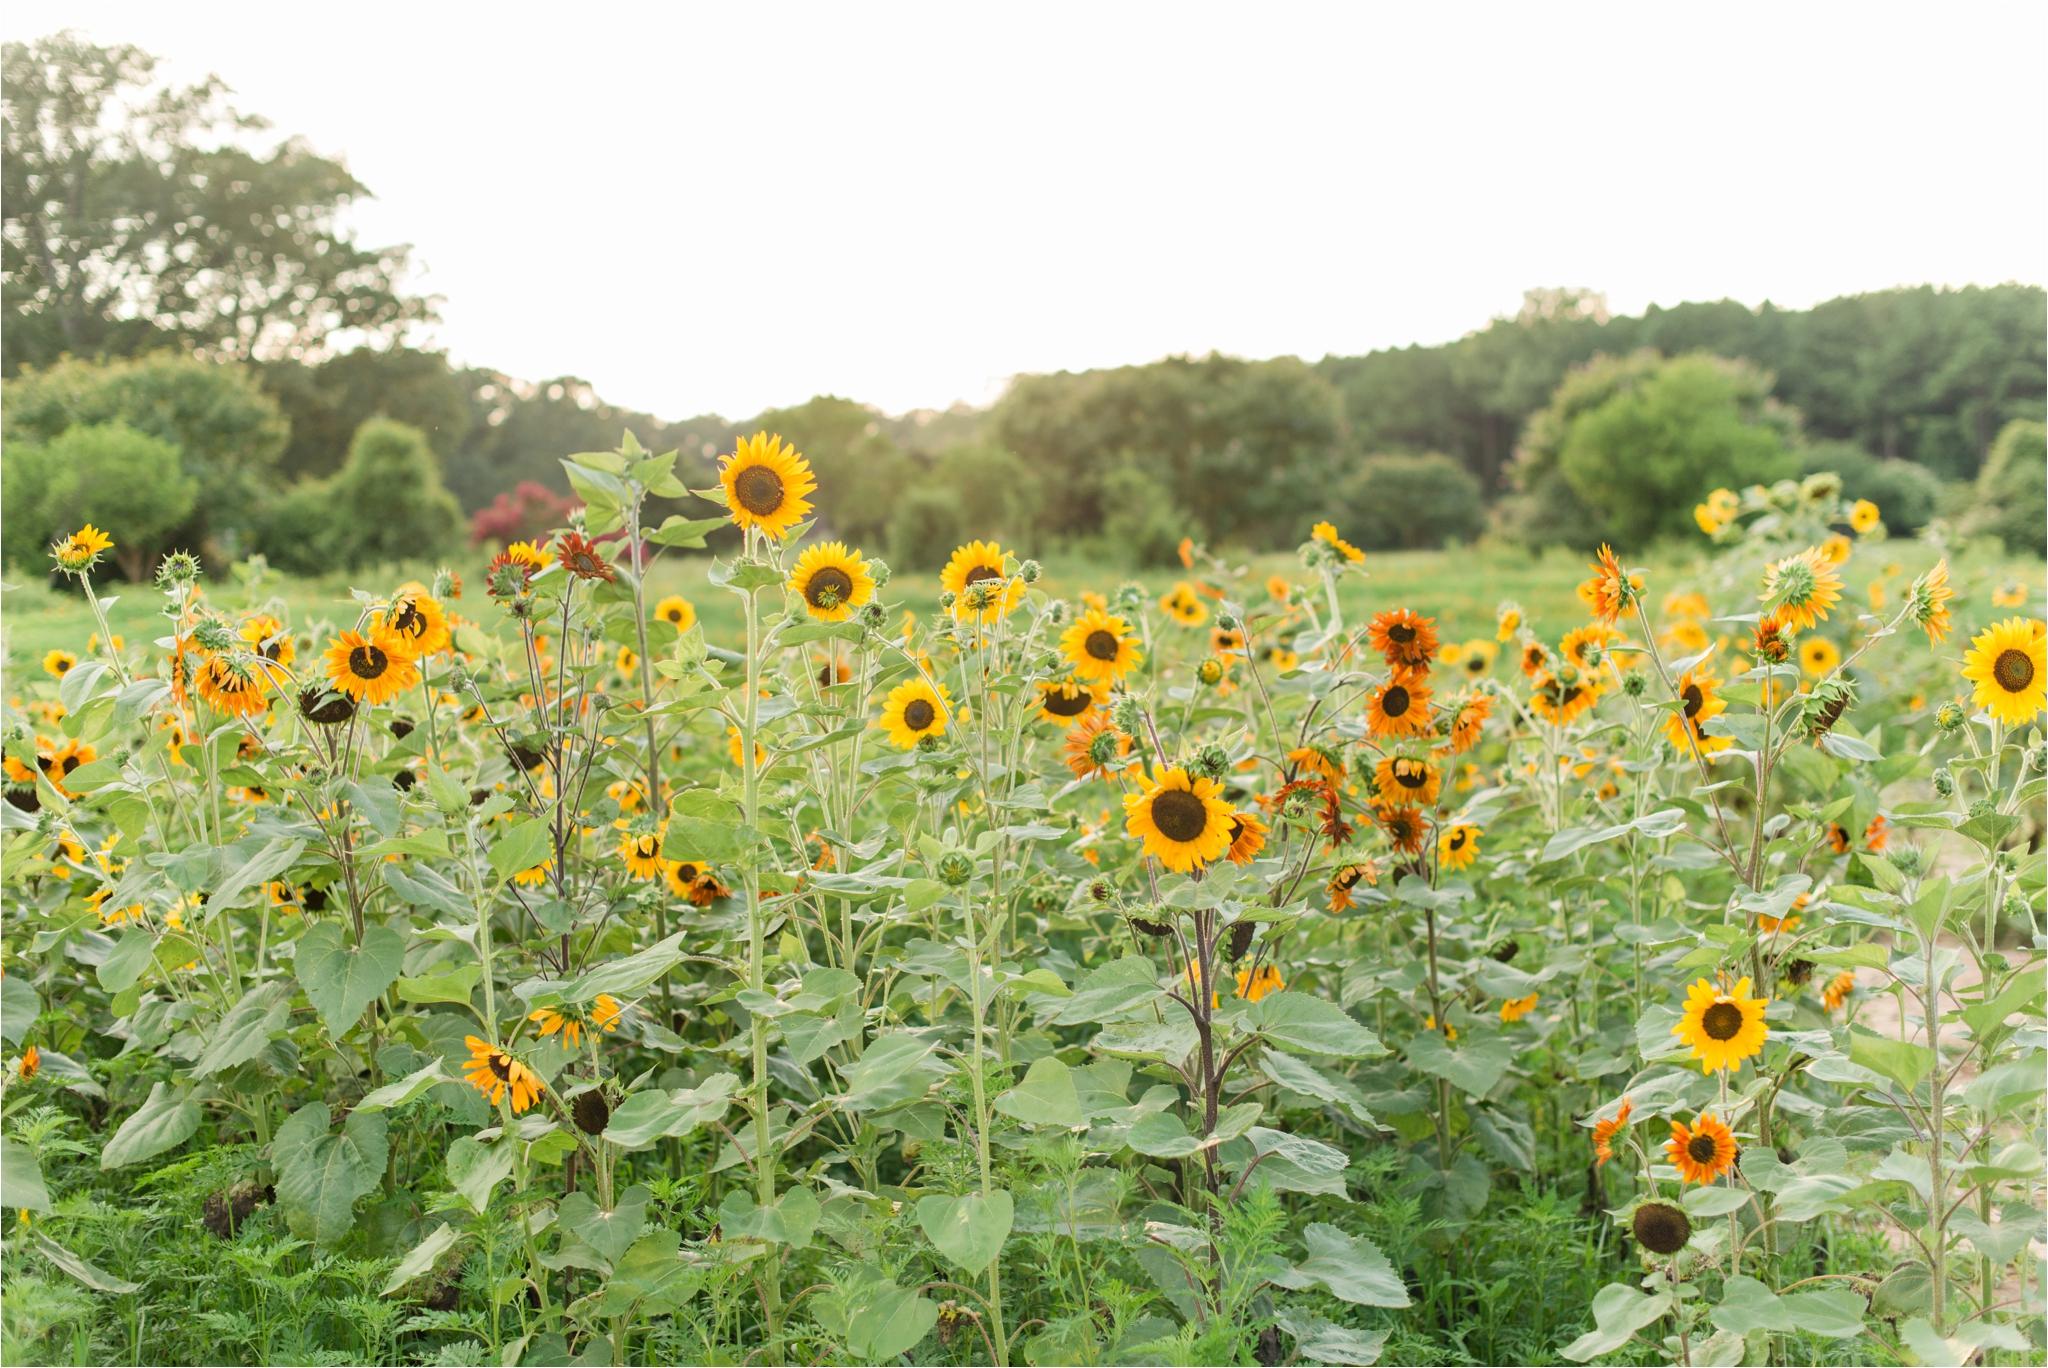 dorthea_dix_park_sunflower_field_raleigh_nc_jaclyn_auletta_photography_0002.jpg